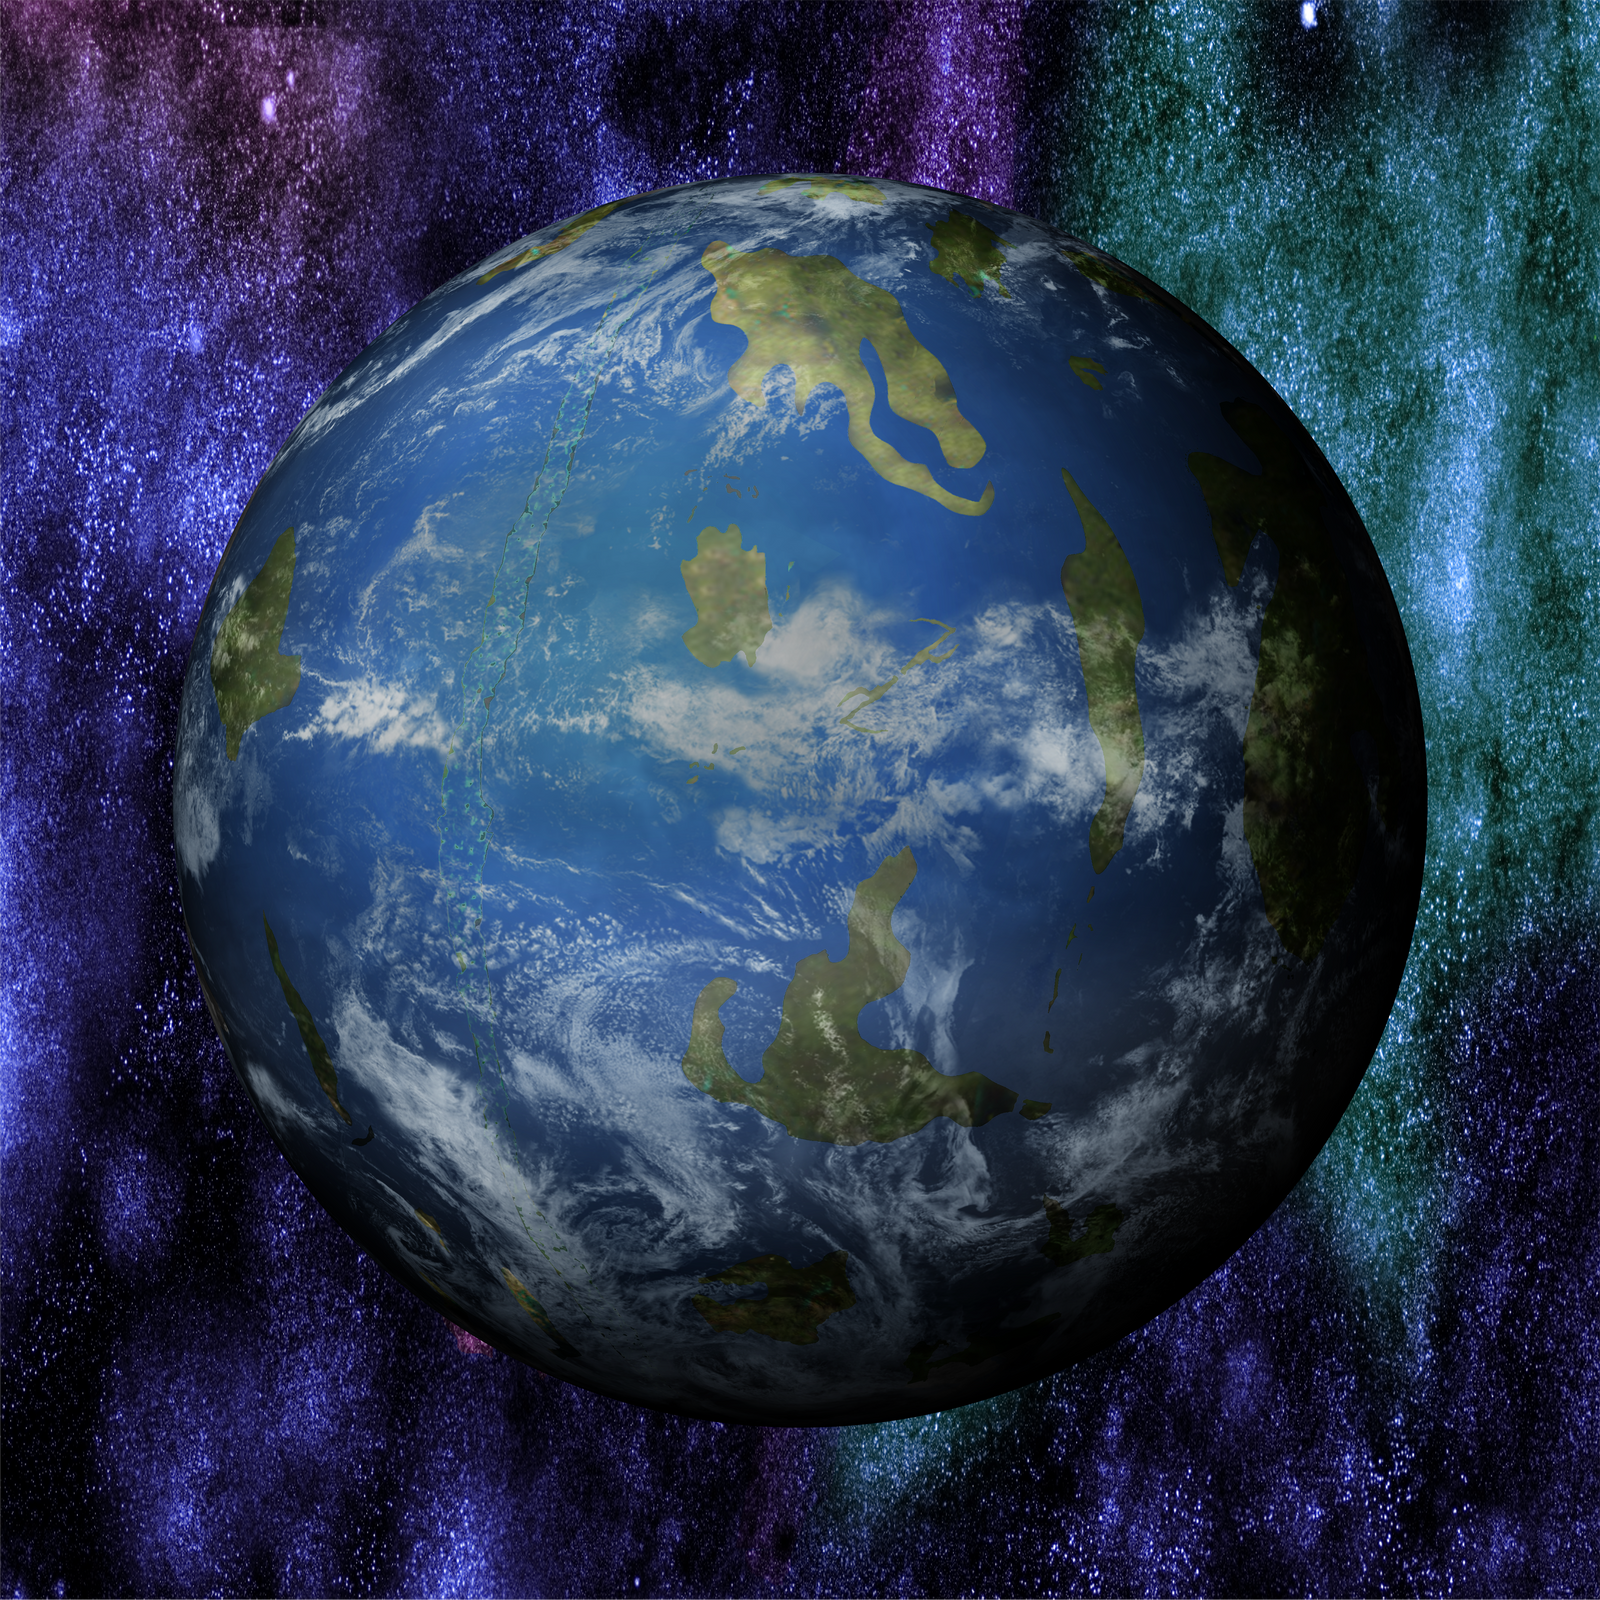 El Planeta Ewdtia by Jakeukalane